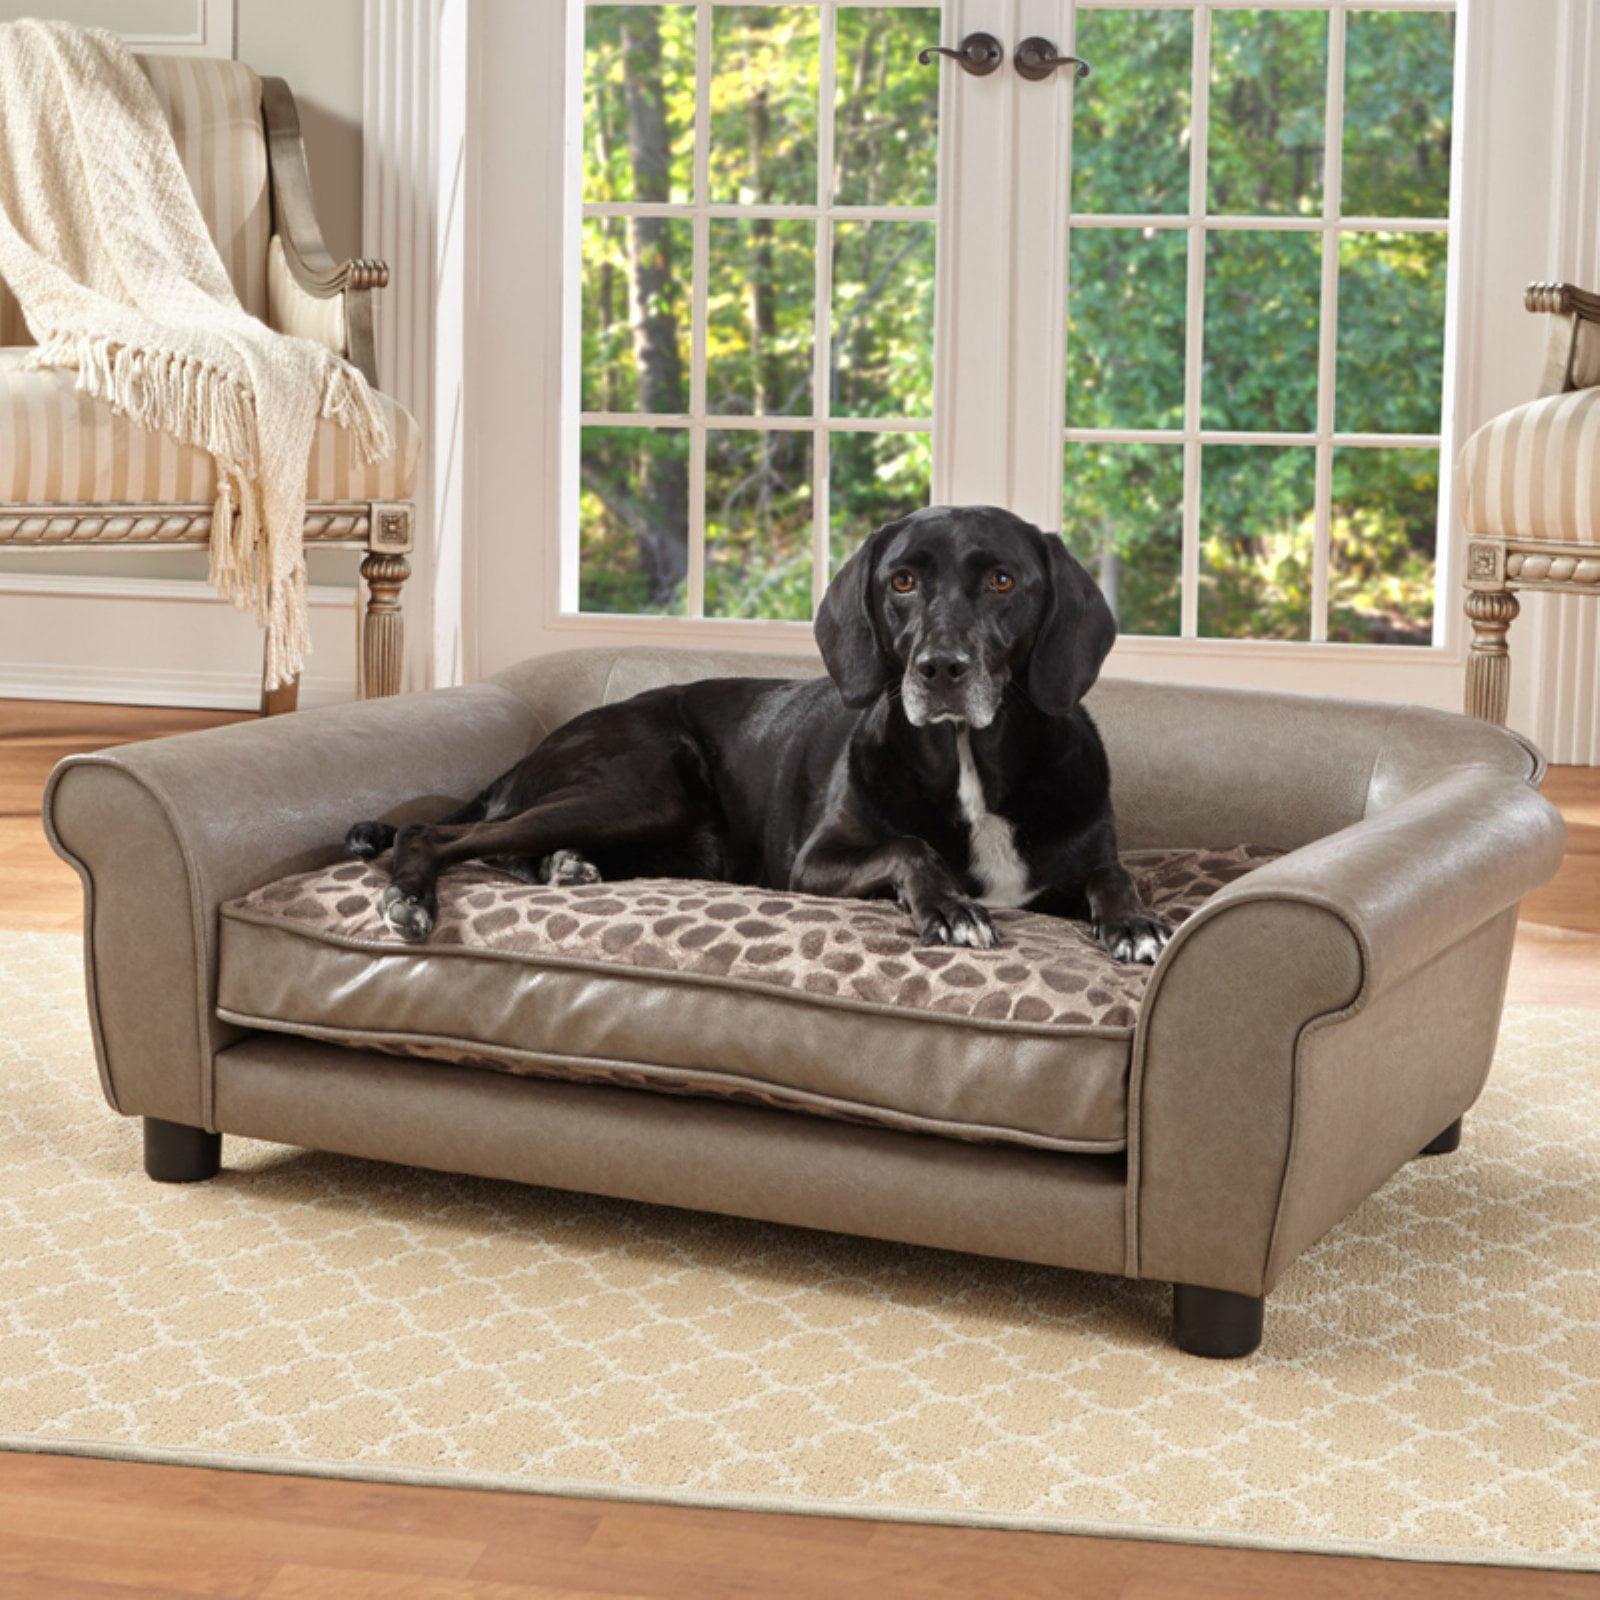 Enchanted Home Pet Rockwell Dog Sofa